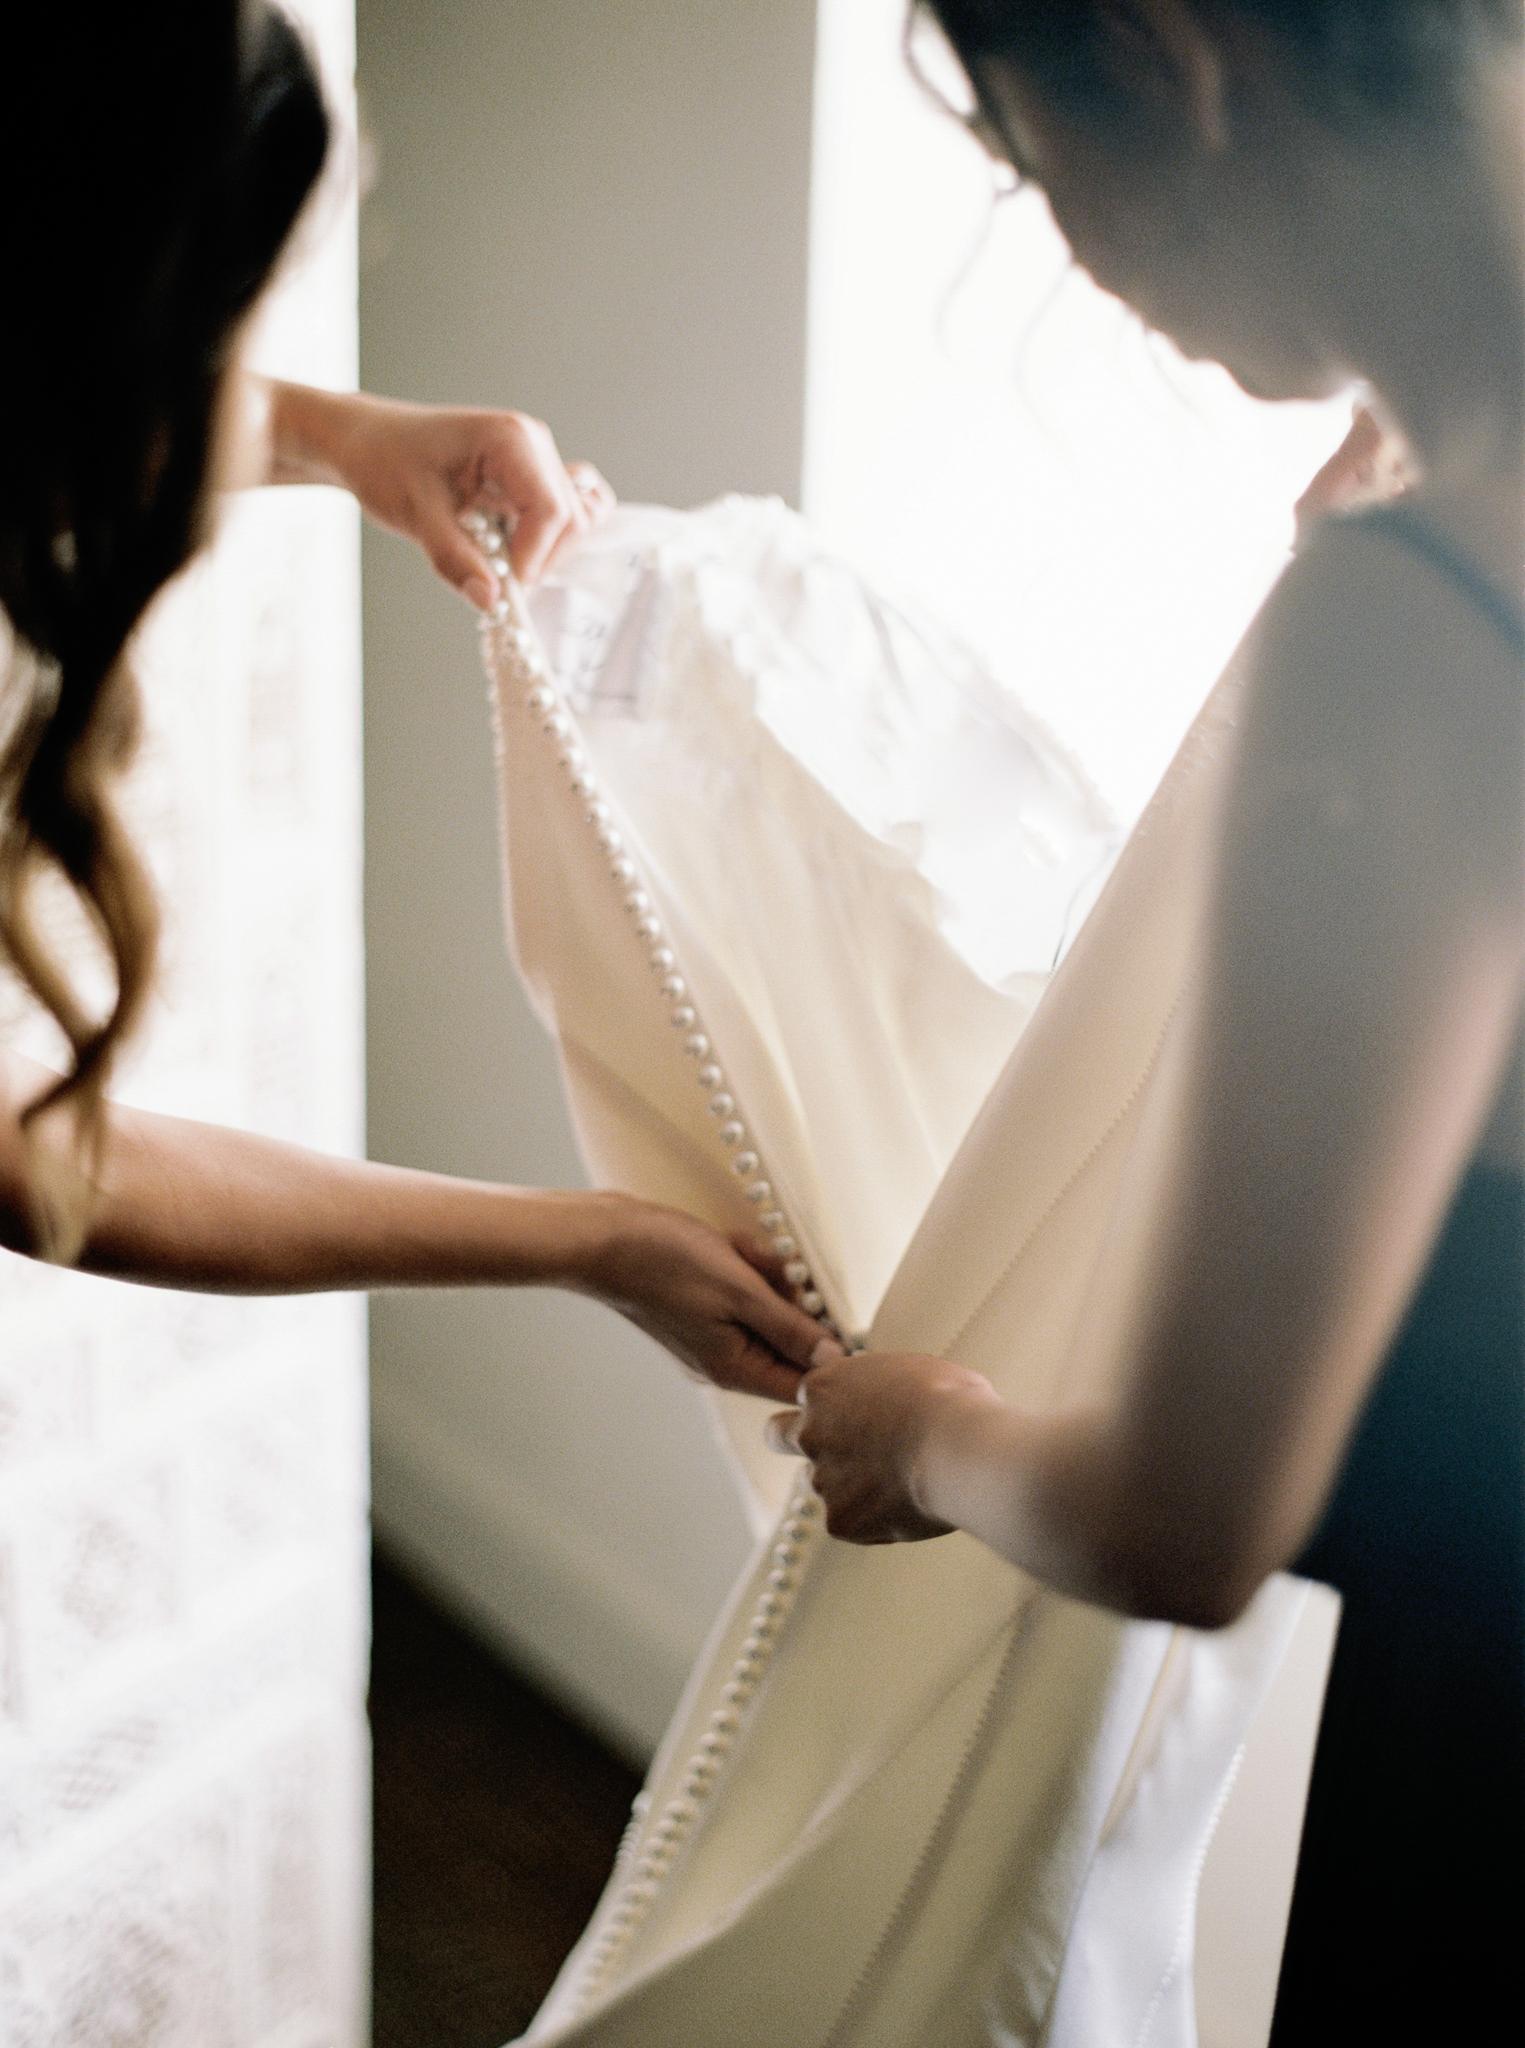 010OutliveCreative_Travel_Photographer_Videographer_Lewis&Clark_Oregon_Elegant_BlackTie_Destination_Wedding.jpg